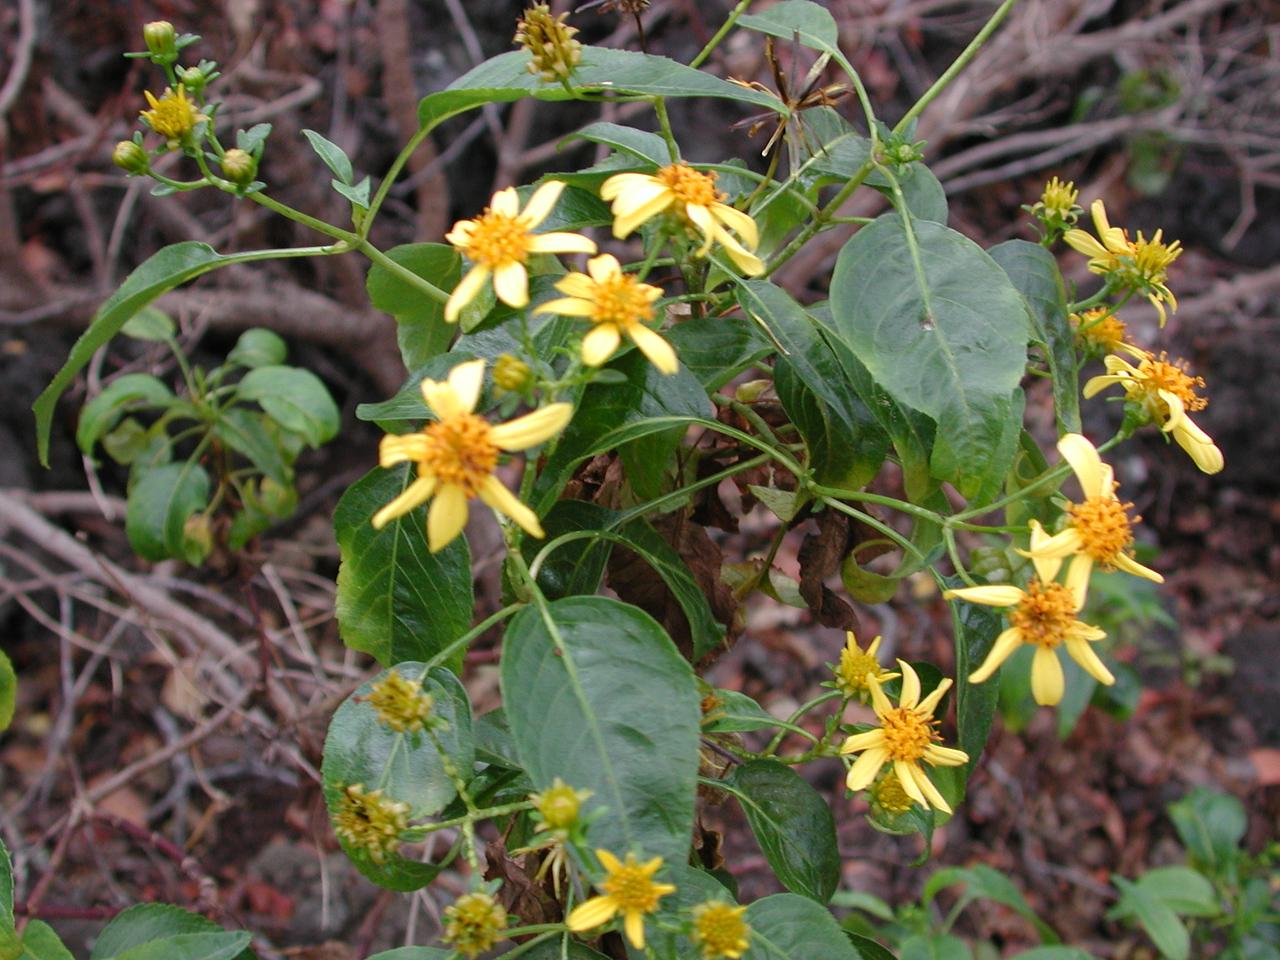 Bidens micrantha subsp. micrantha